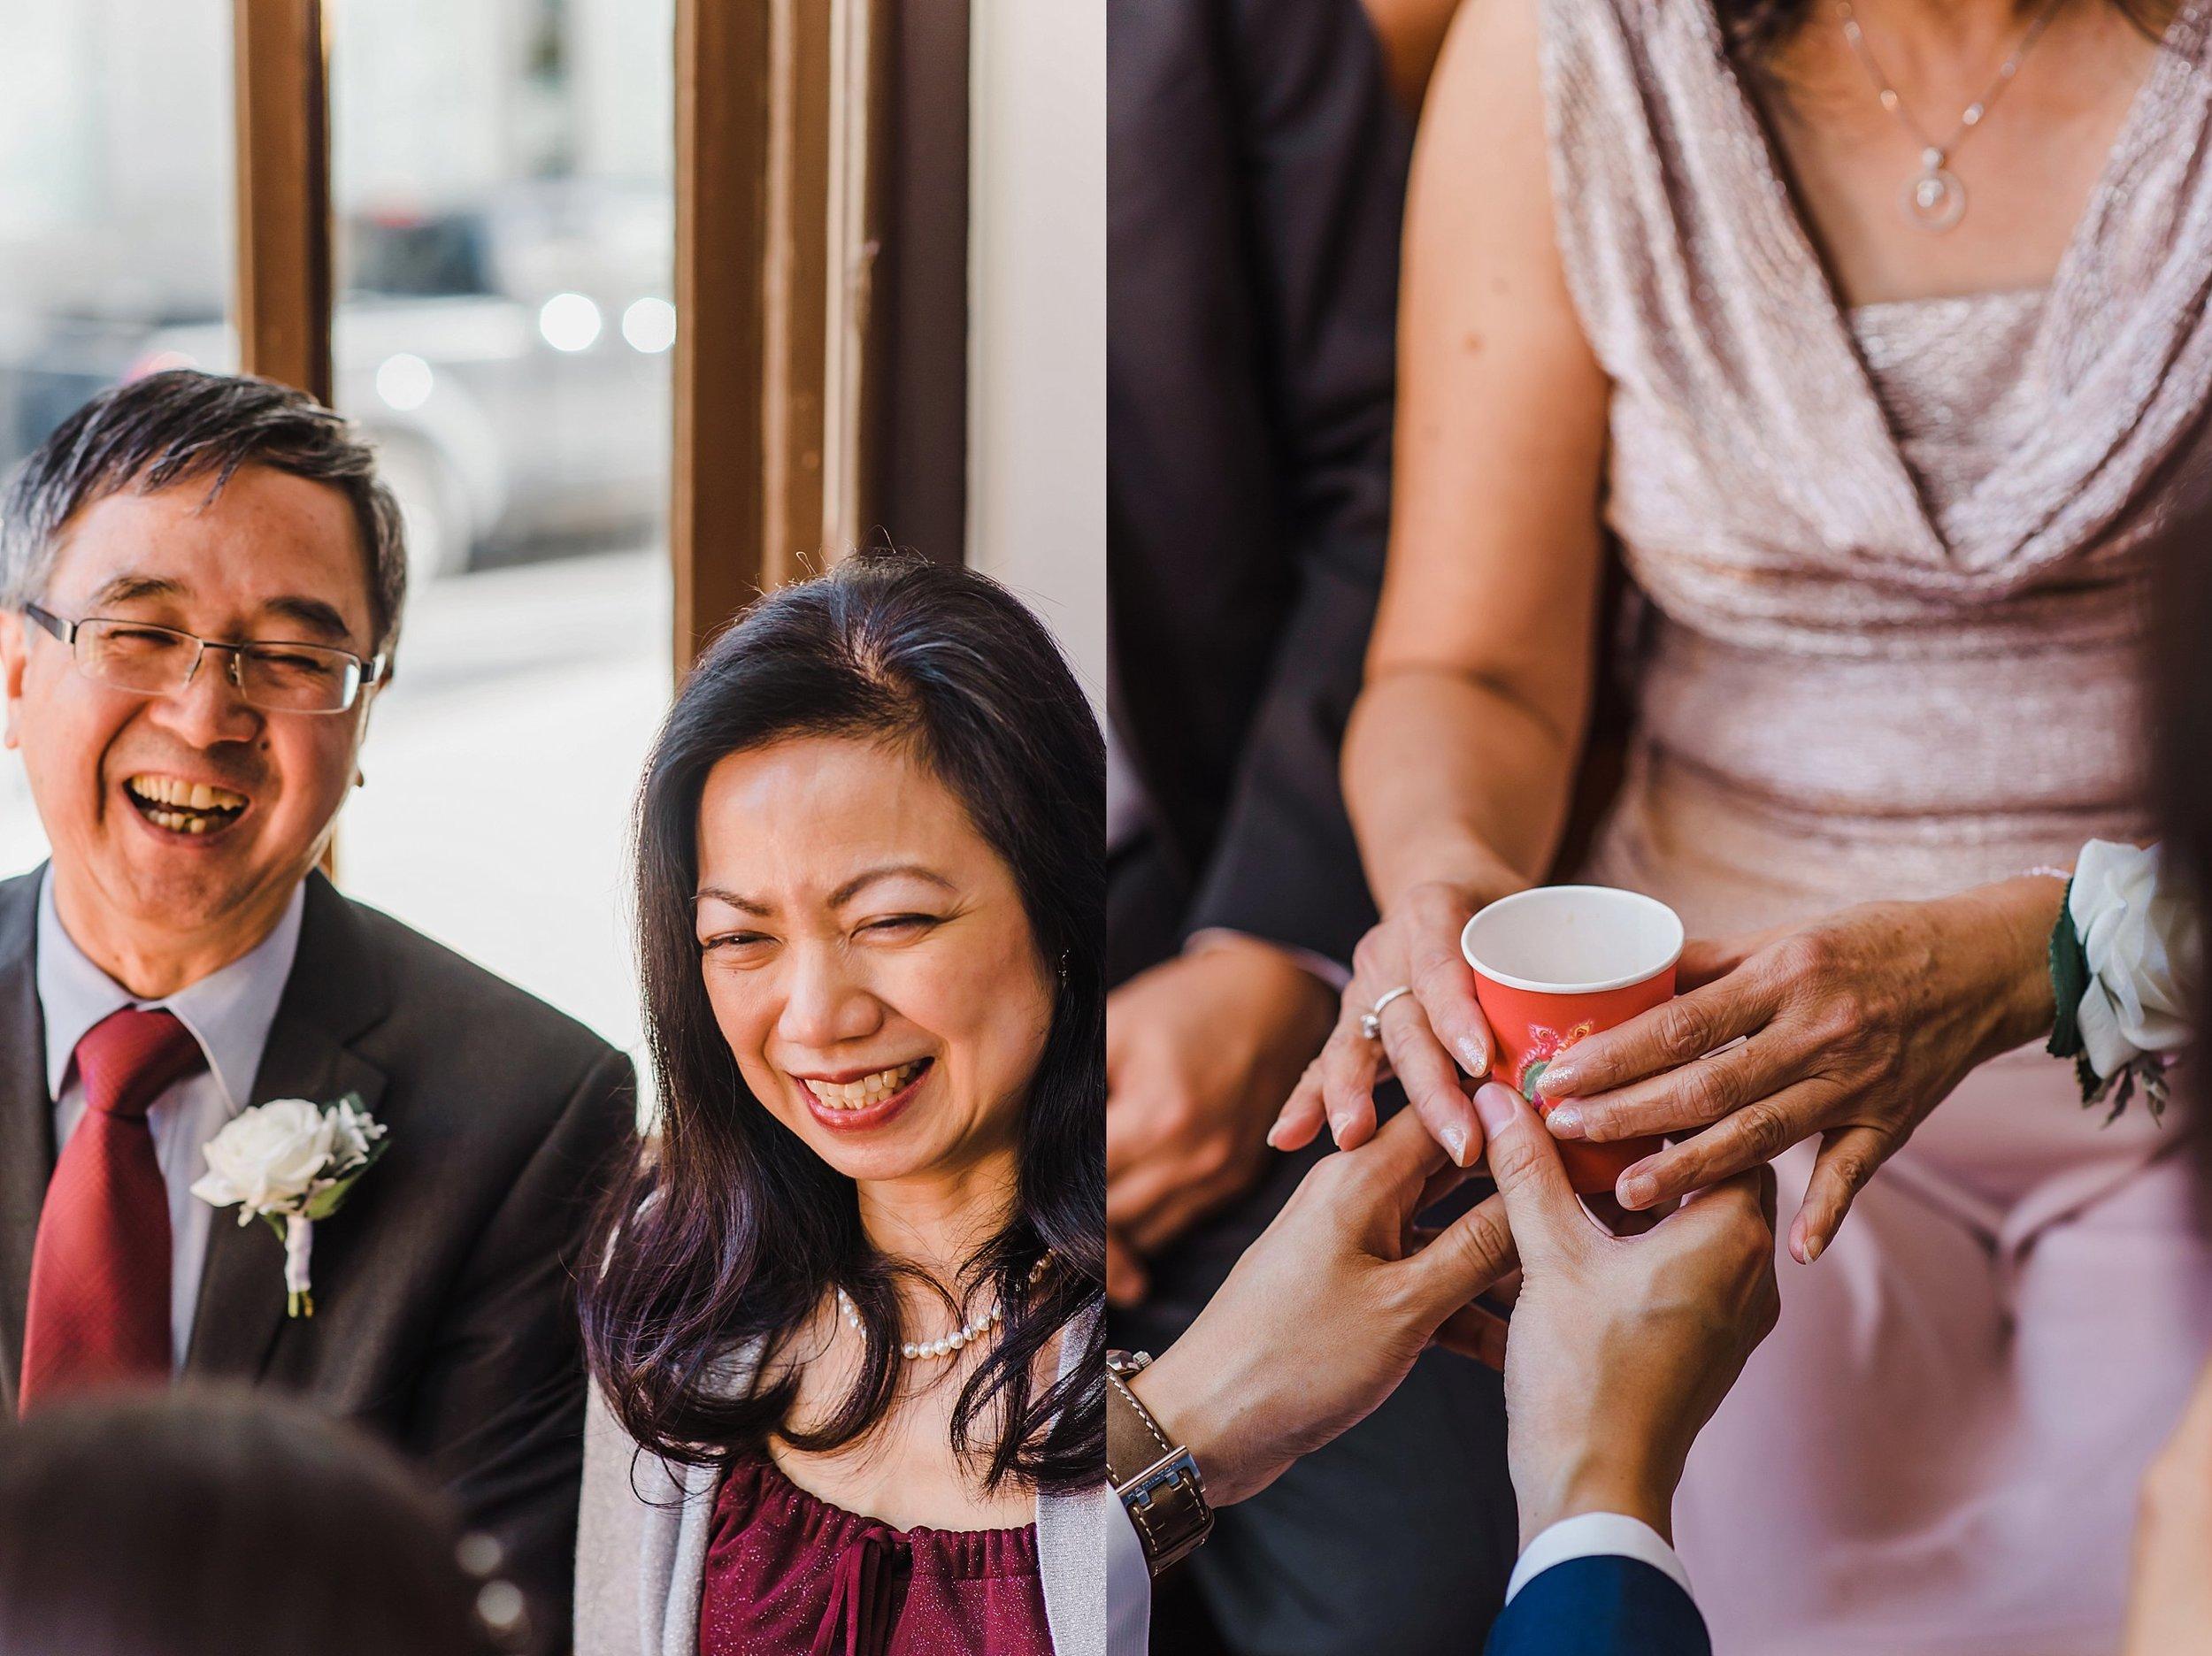 light airy indie fine art ottawa wedding photographer | Ali and Batoul Photography_1520.jpg